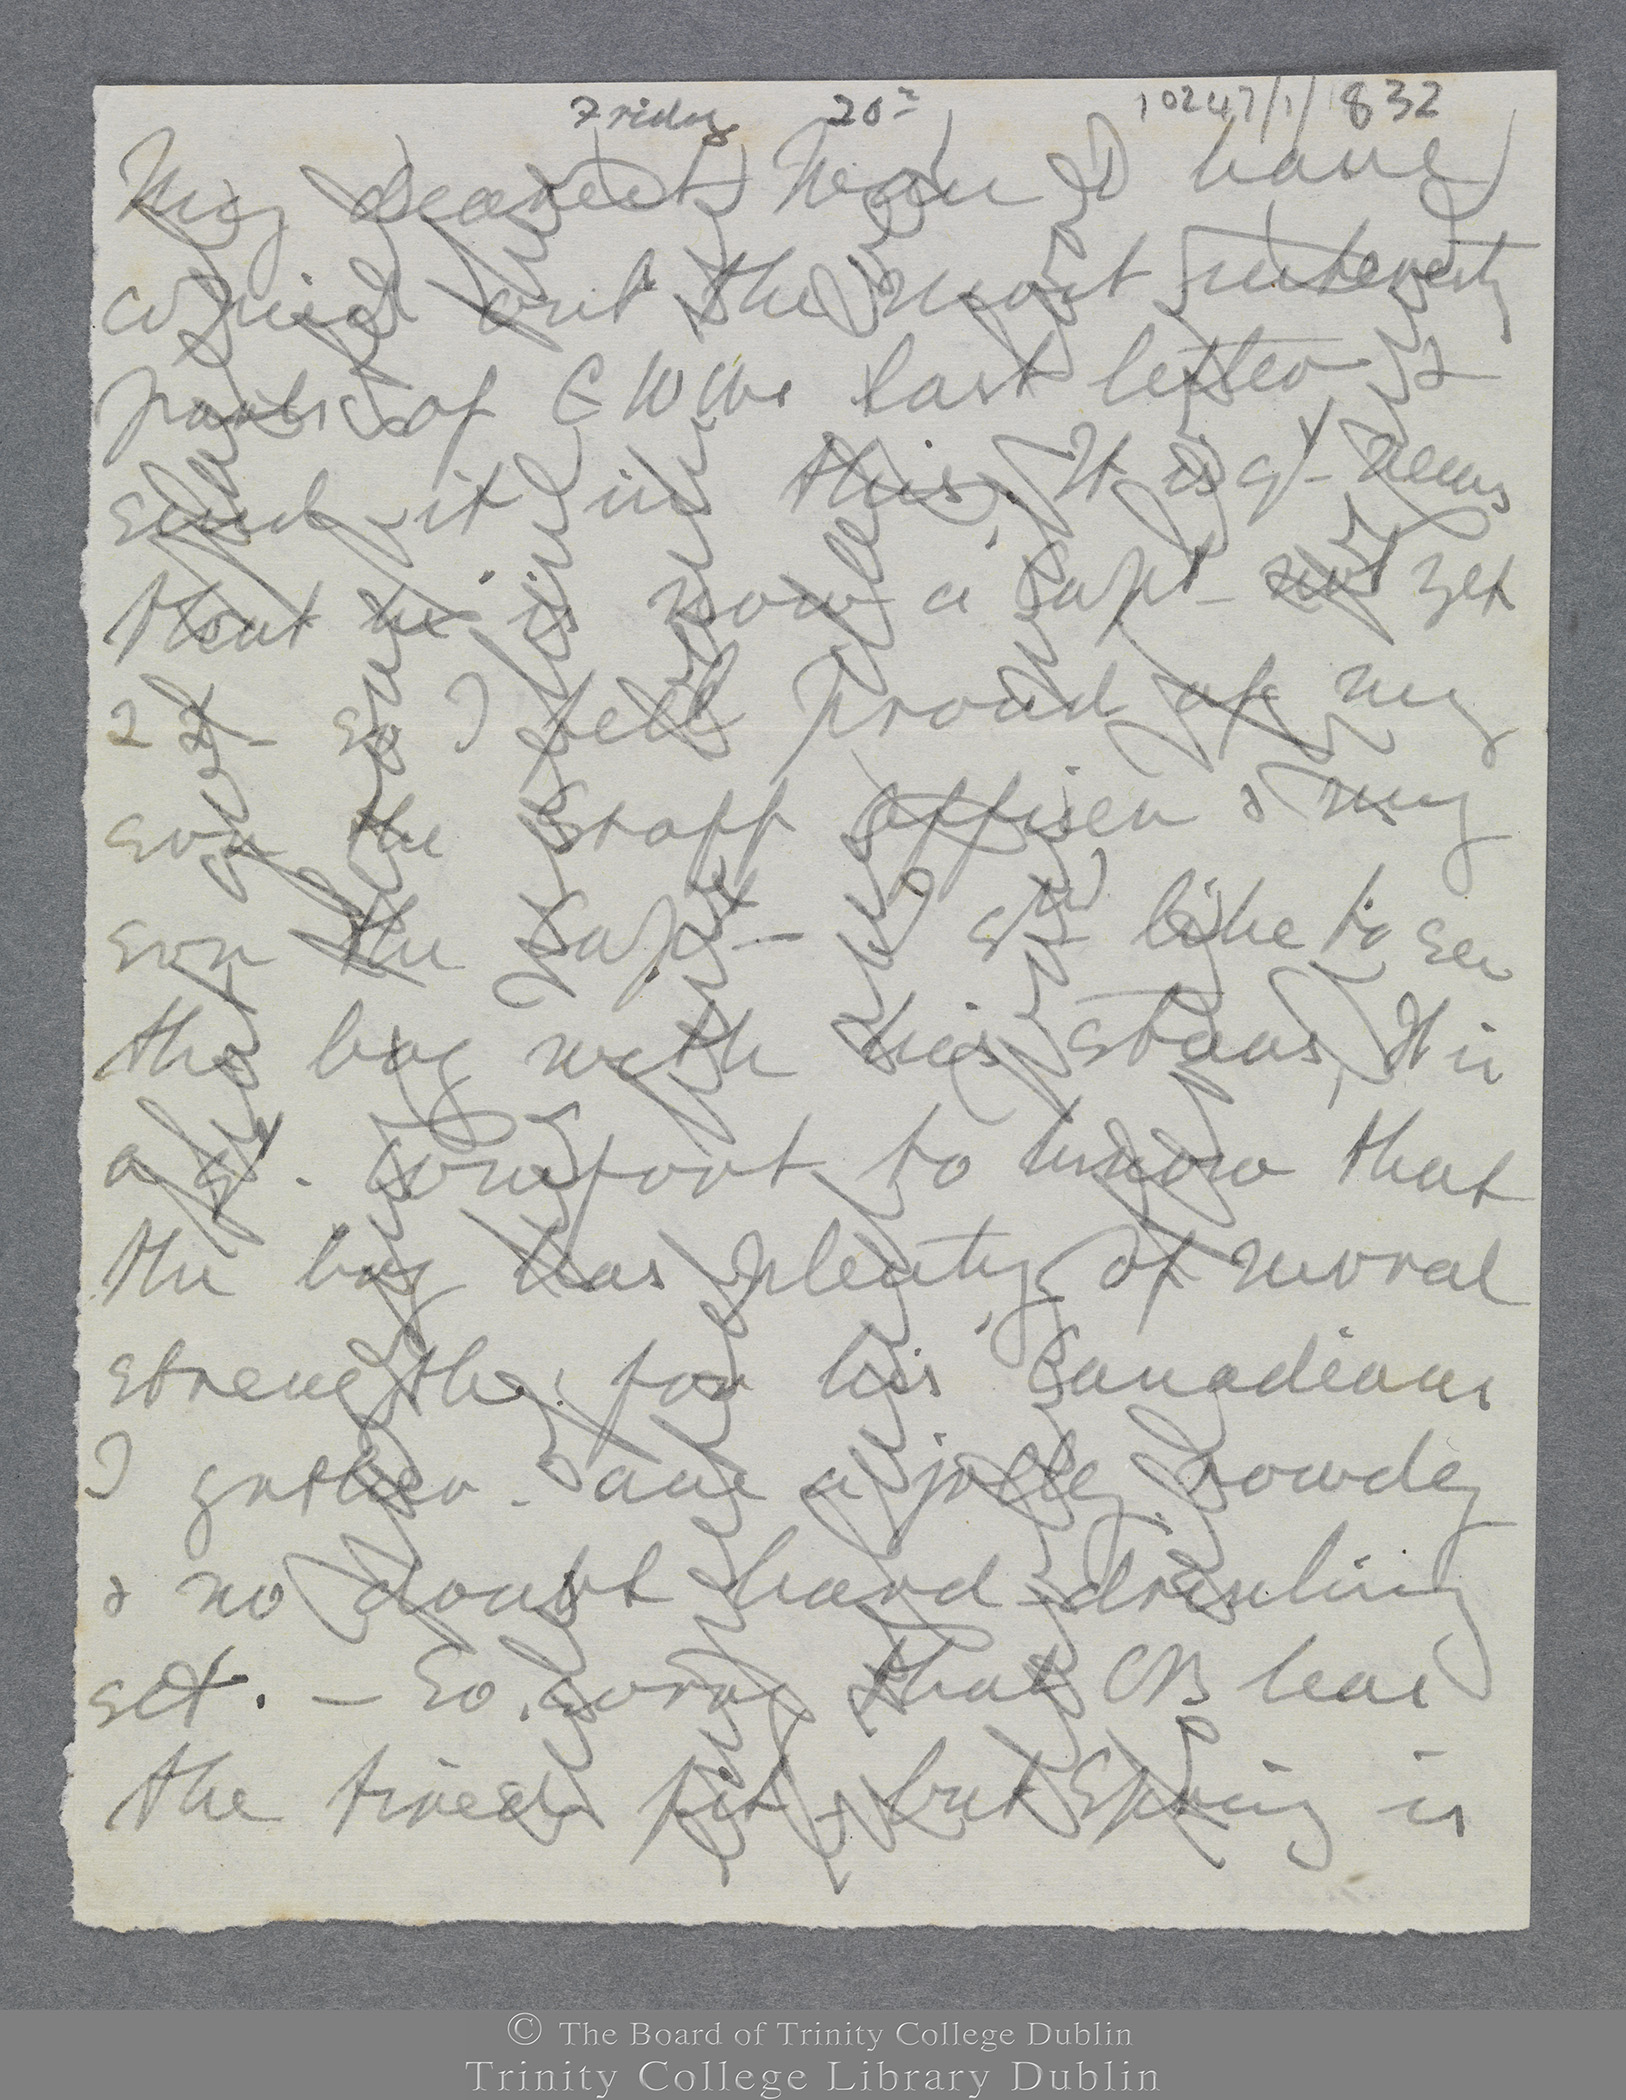 TCD MS 10247/1/832 folio 1 recto